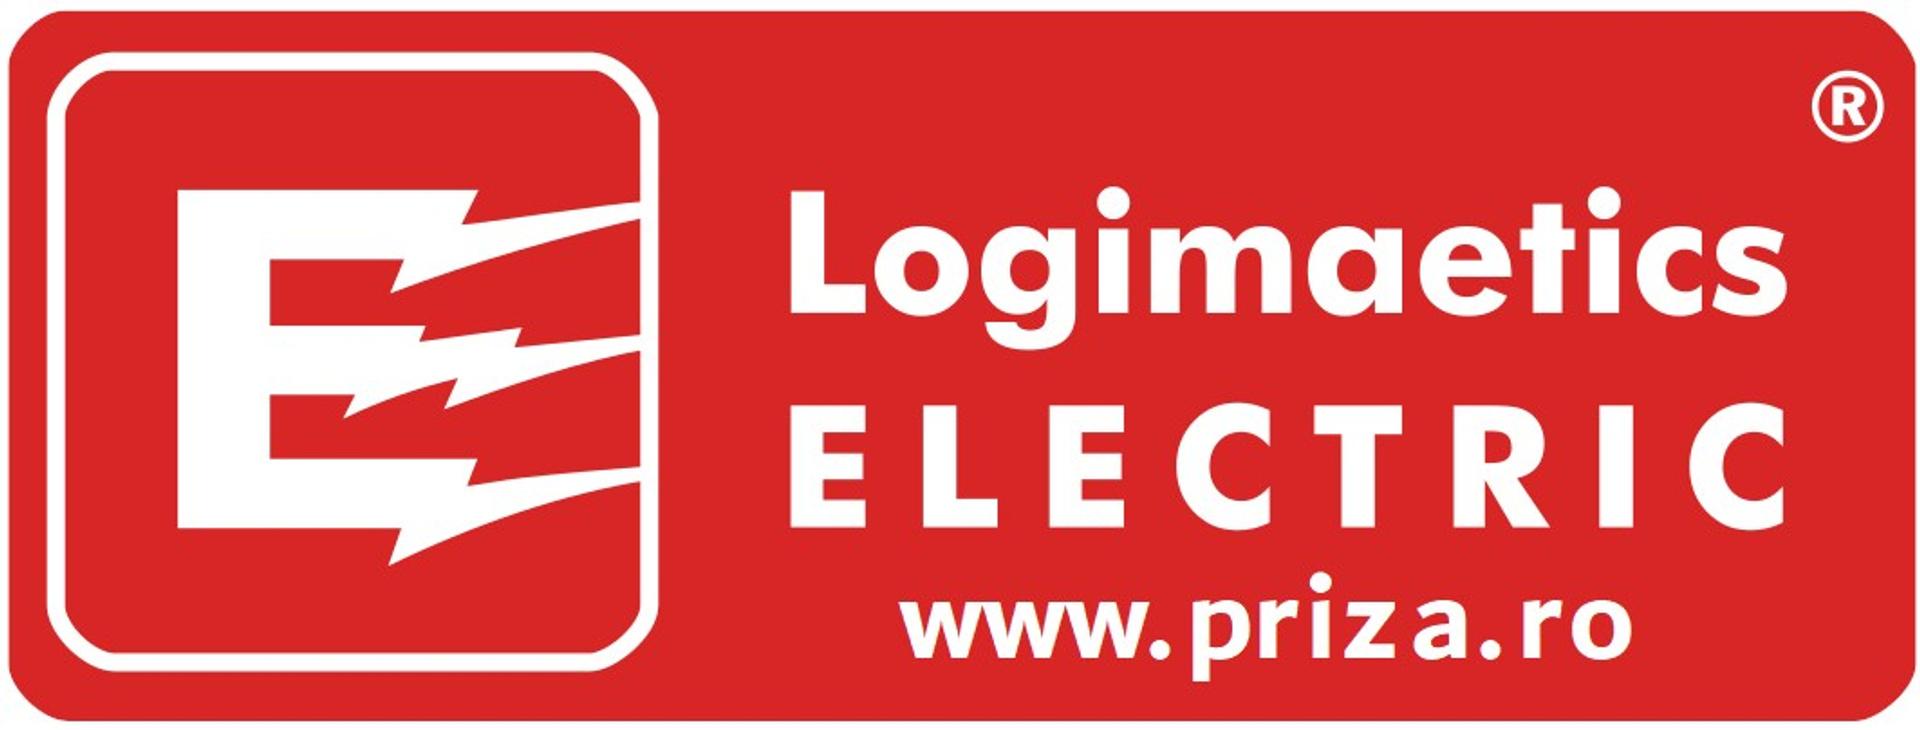 Logo + priza ro